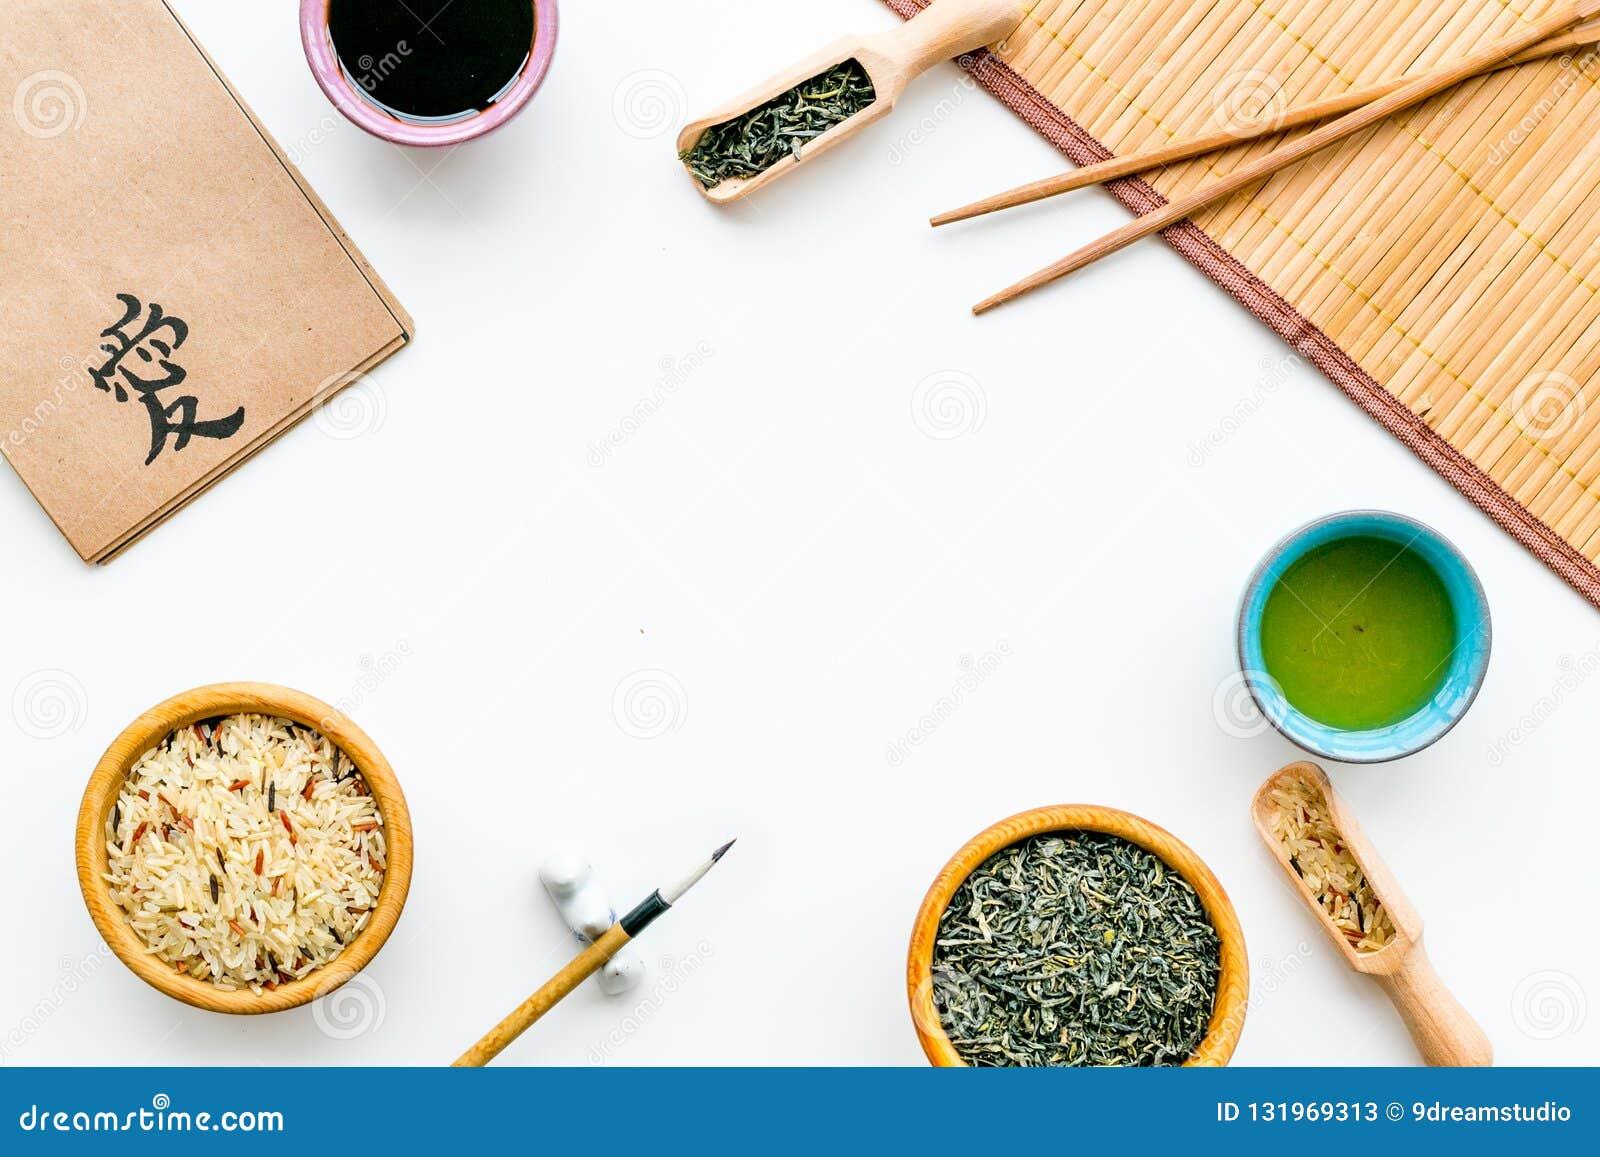 Chinese traditional symbols concept. Tea, rice, hieroglyph symbol, bambootabe mat, chopsticks, soy sause on white